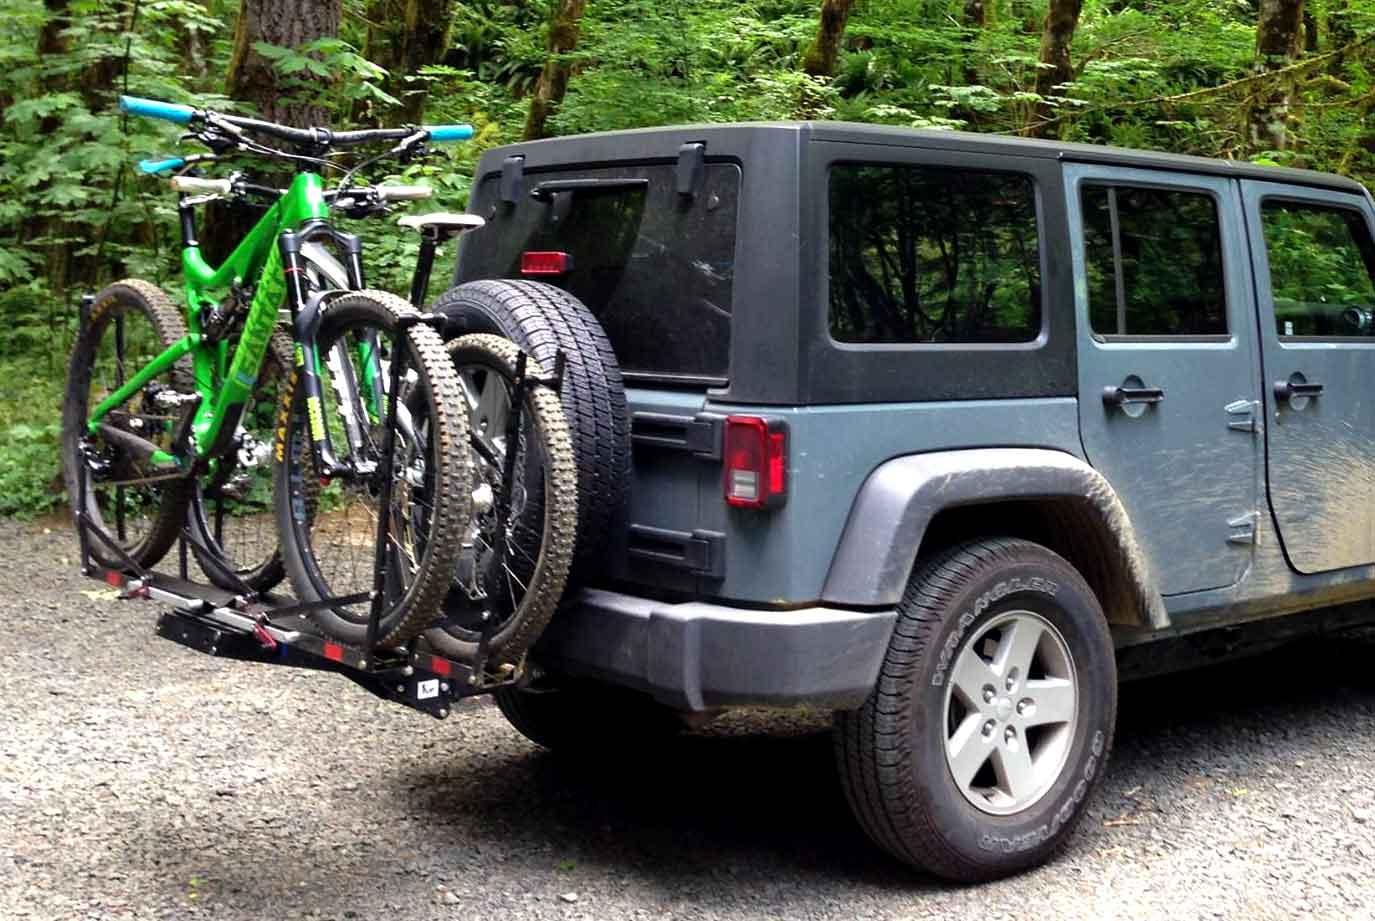 Hitch Bike Rack Reviews >> 1up Usa Bike Rack Review Gearjunkie